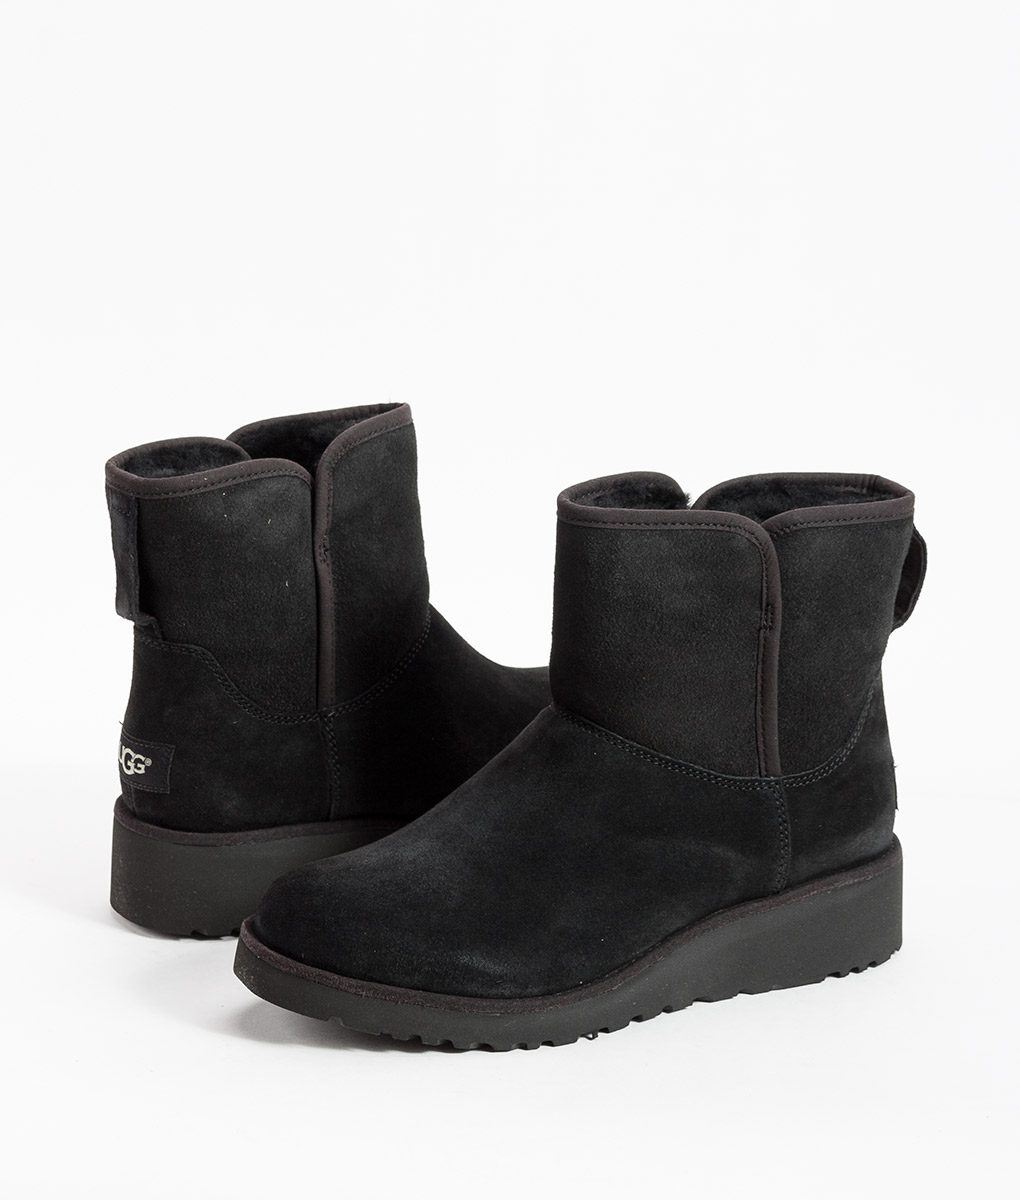 UGG Women Ankle Boots KRISTIN, Black 234.99 1